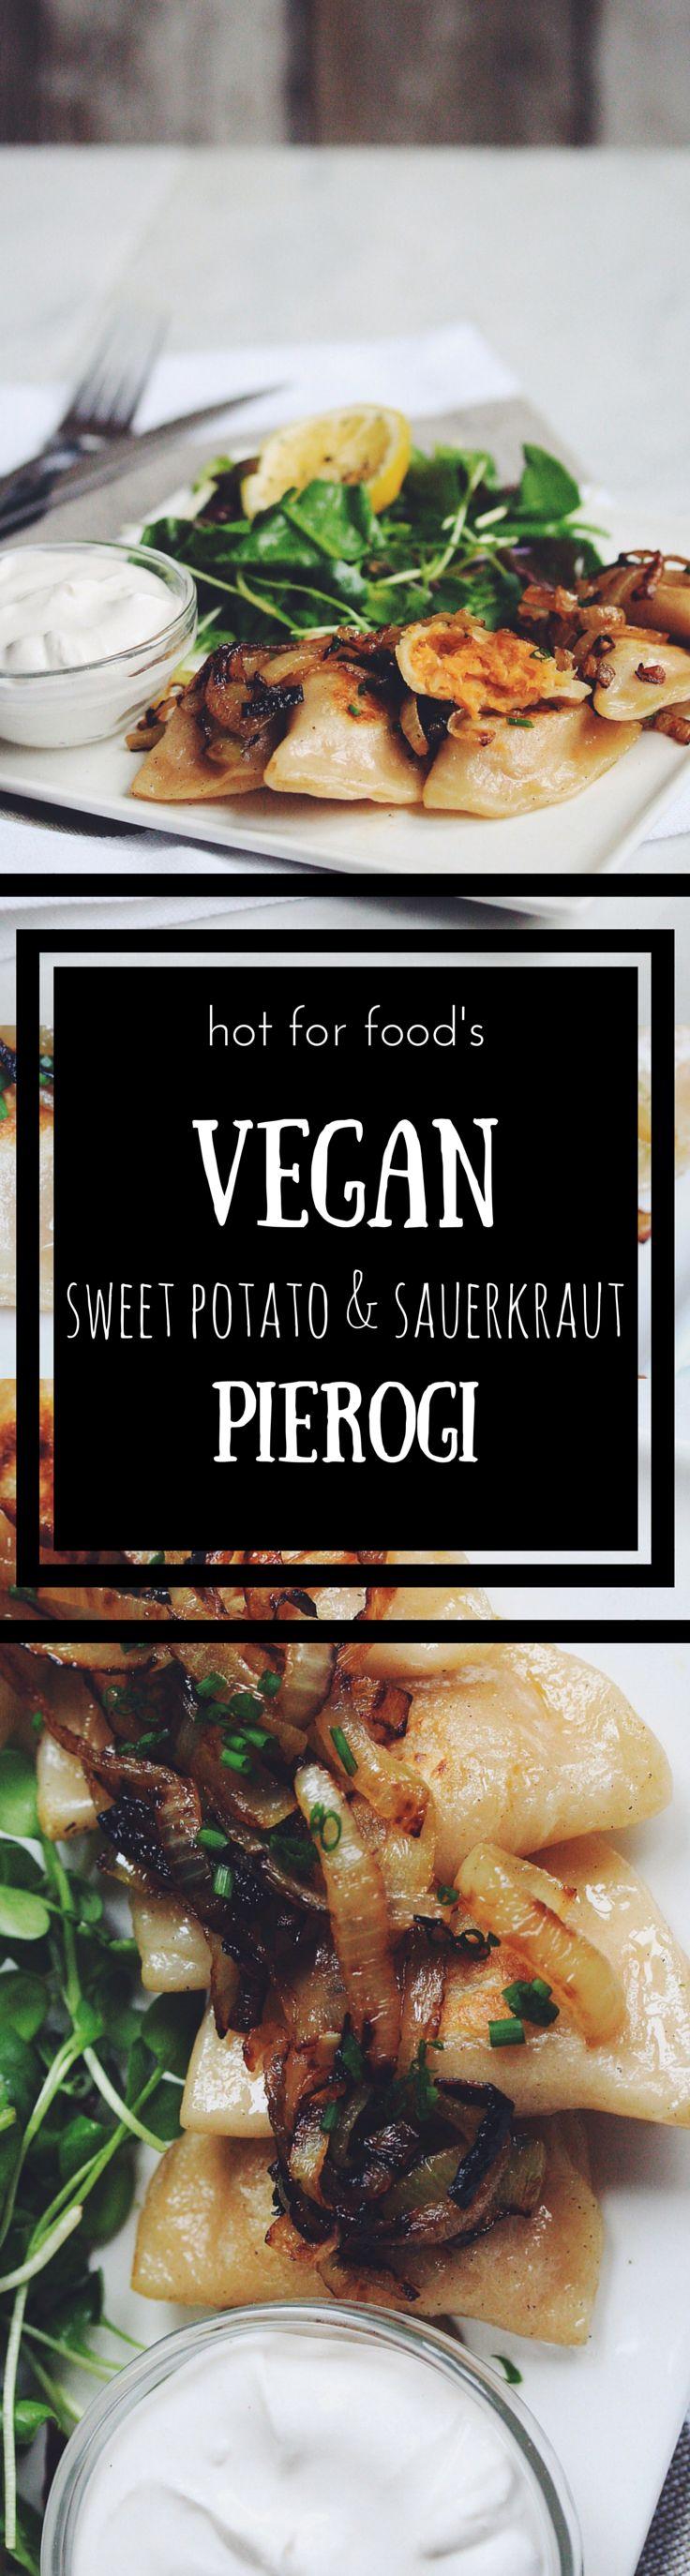 vegan sweet potato and sauerkraut pierogi RECIPE on hotforfoodblog.com